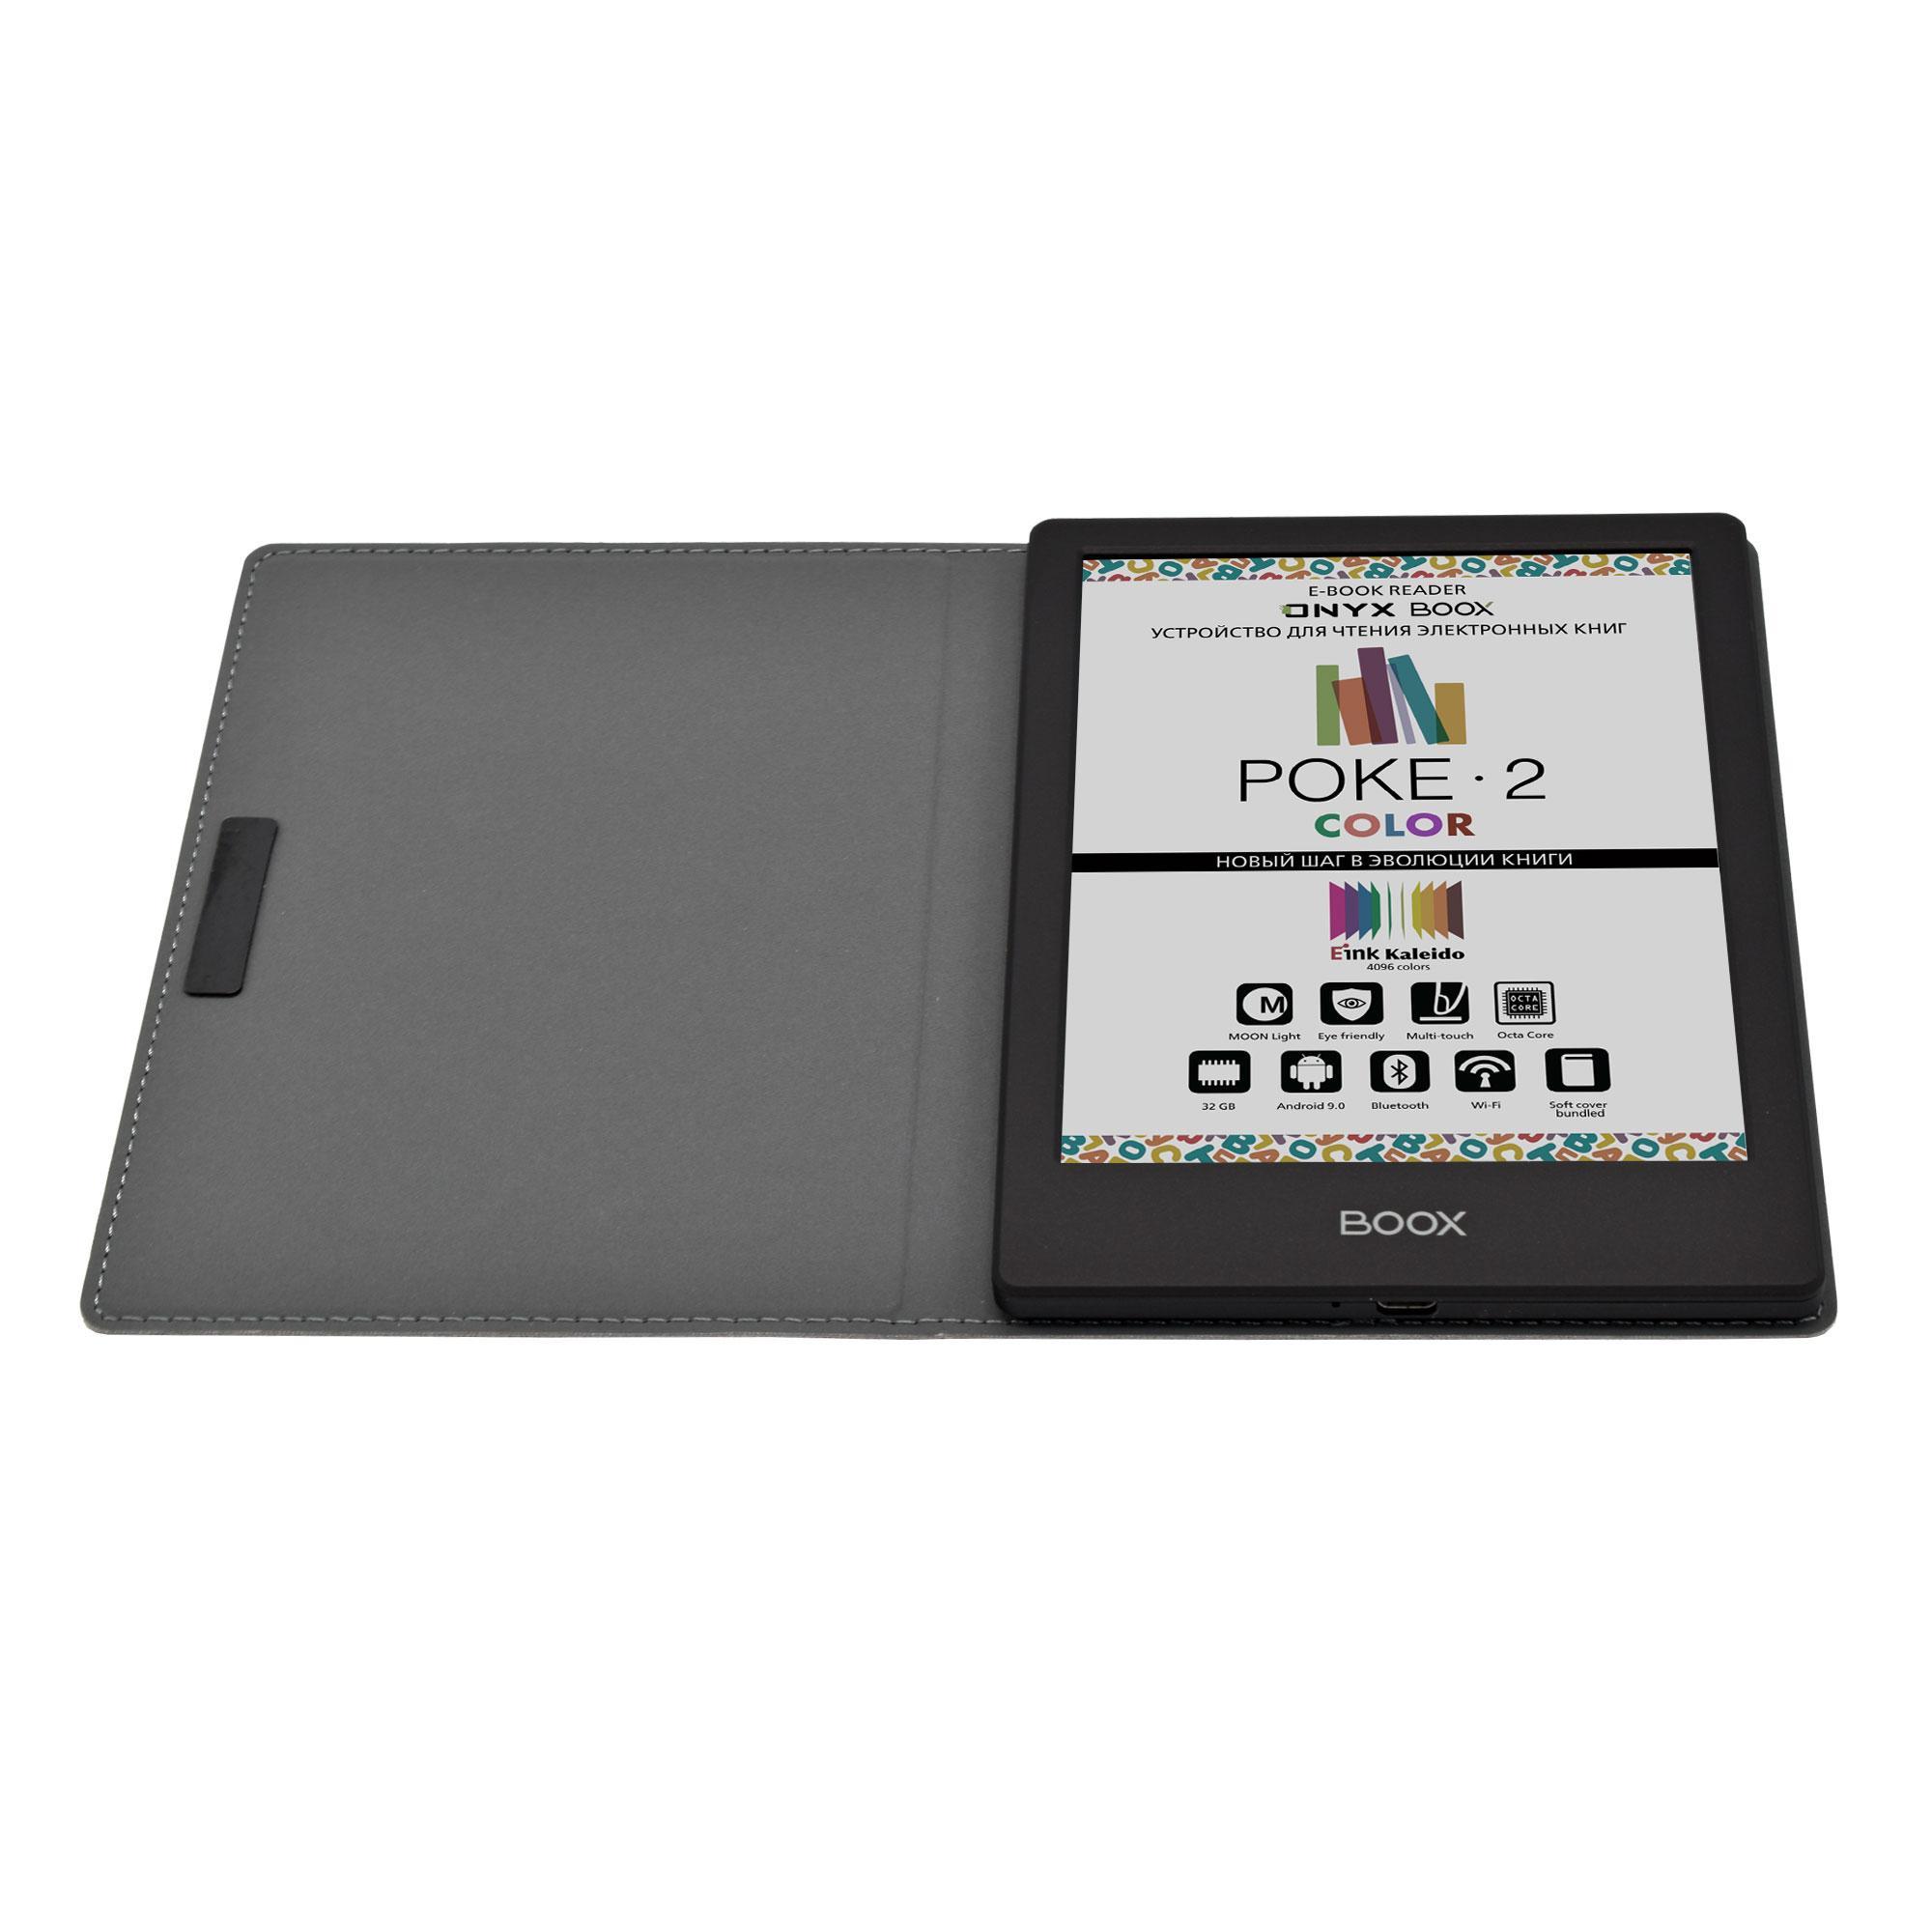 ONYX BOOX Poke 2 Color – все оновой читалке скрутым дисплеем имощным процессором